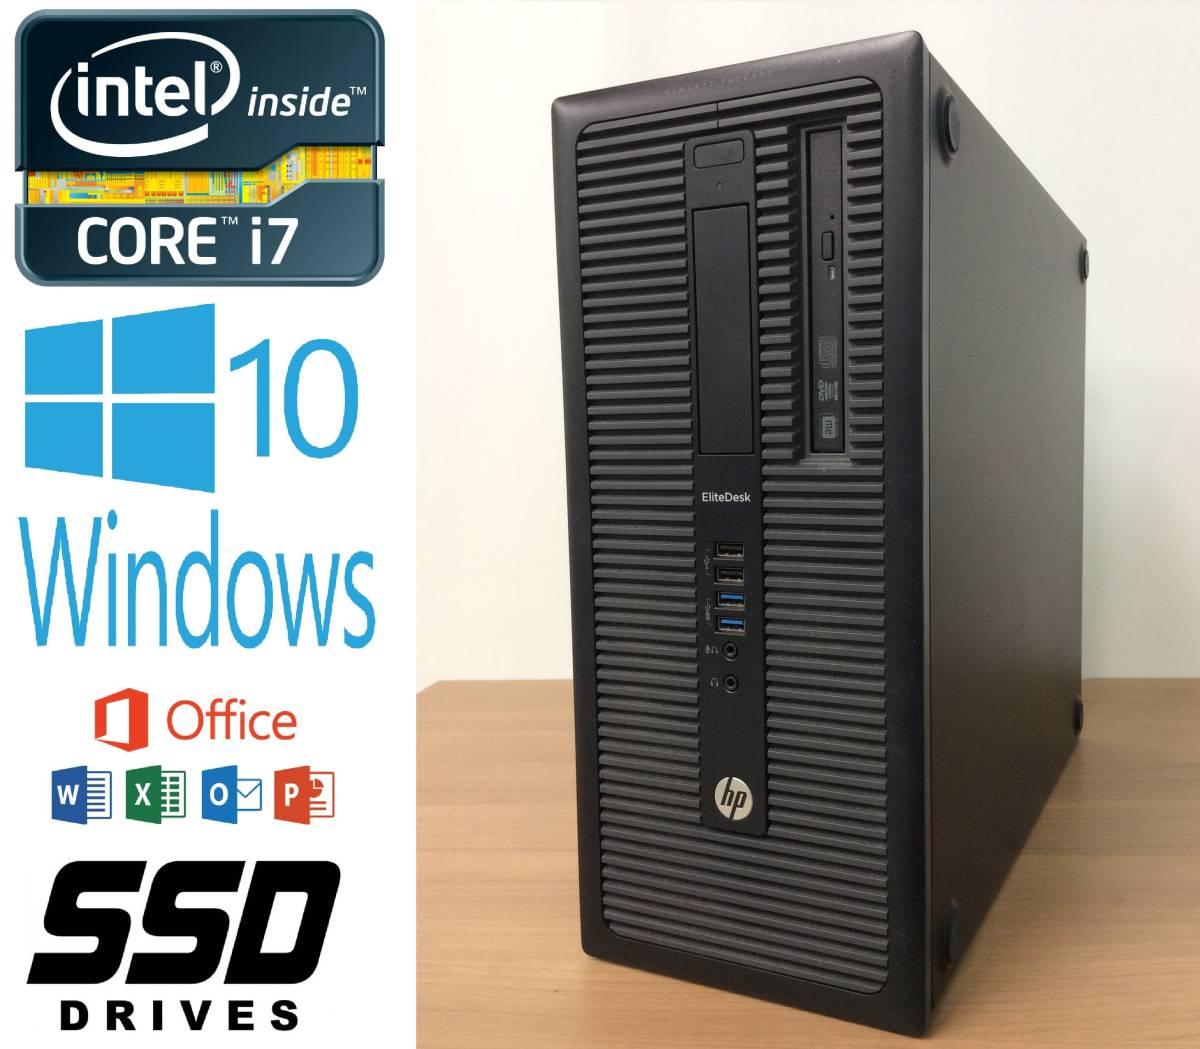 D7F2★超高速 i7★EliteDesk 800 G1 TWR [ Core i7-4770 / 32G / 新品SSD 1TB + HDD 2TB / WIFI / DVD / Win10 PRO / MS Office 2019 ]